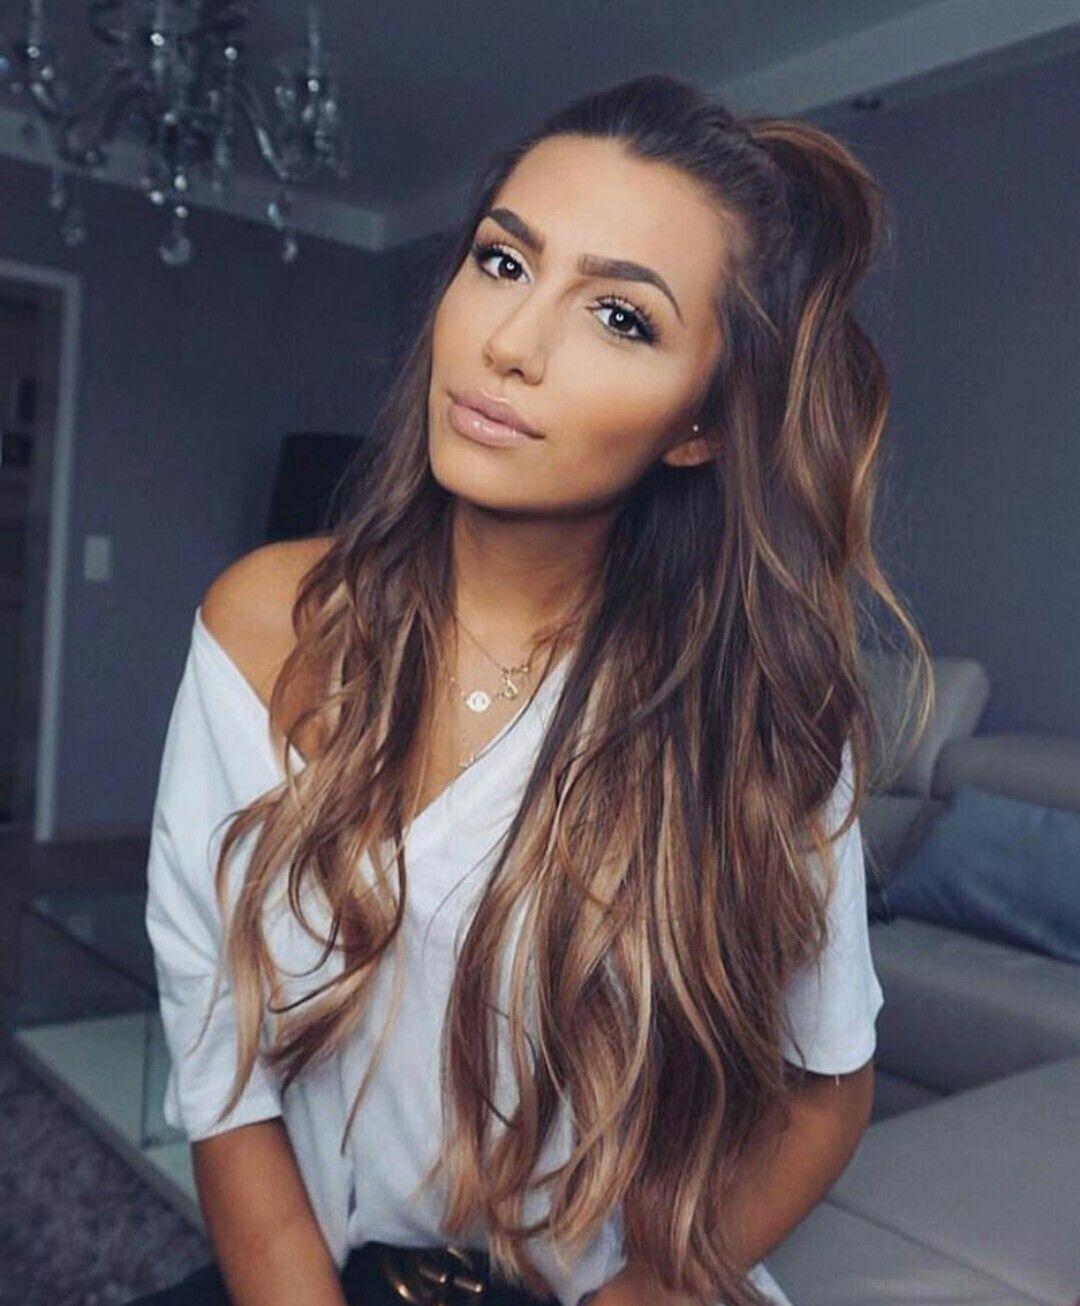 Caramel Highlights Hair Color For Brown Skin Hair Styles Long Hair Styles